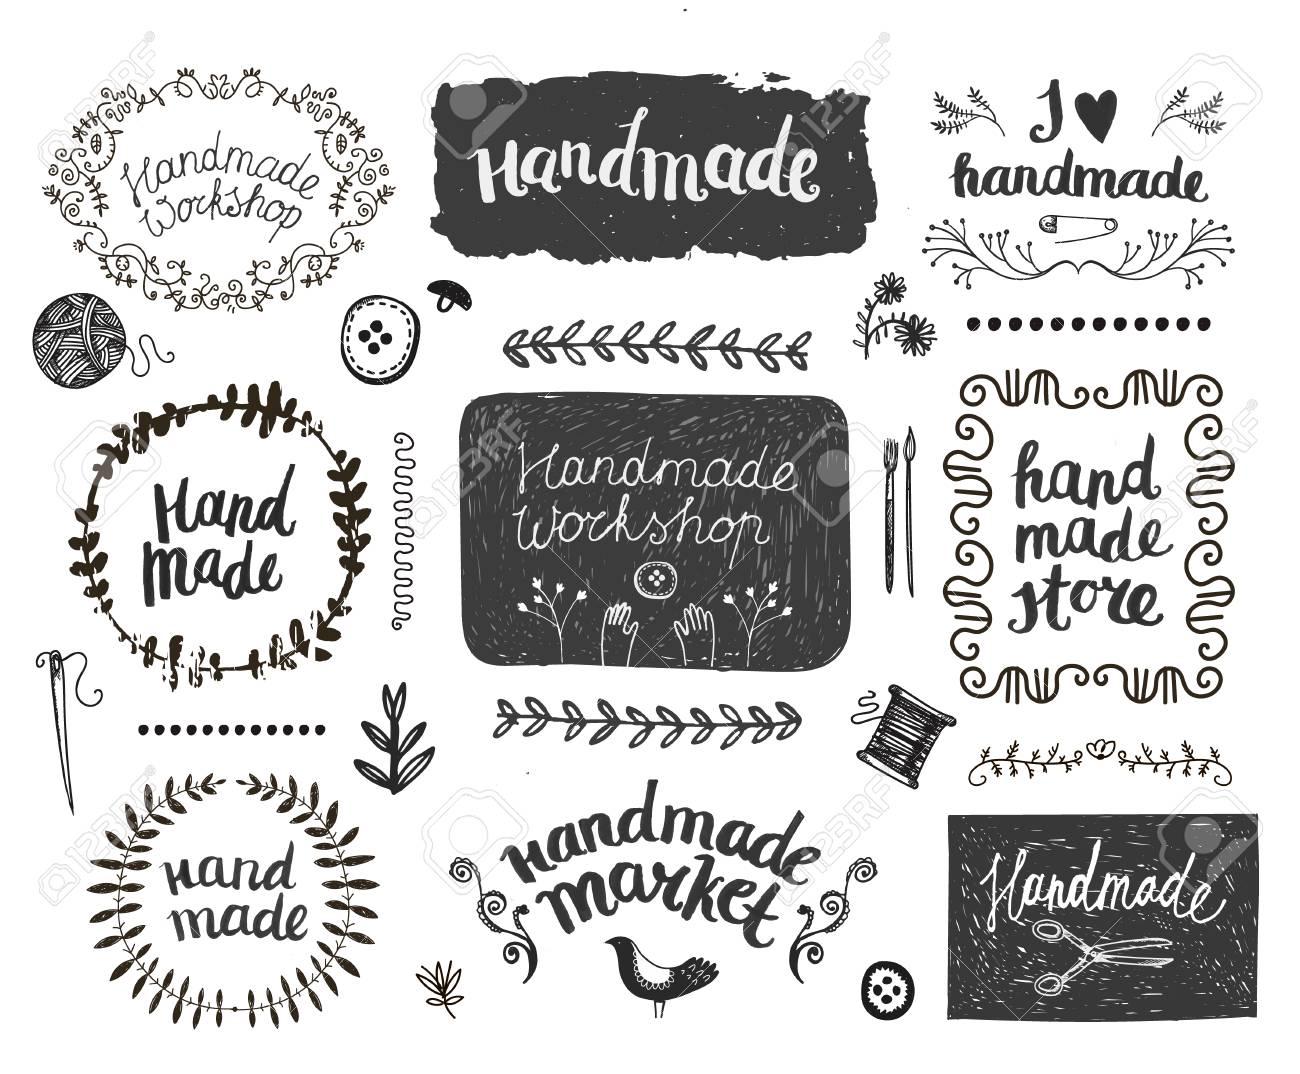 Vector set of hand drawn doodle frames, badges. Handmade, workshop, hand made shop graphic design set. Arts and crafts, sewing elements, icons, , badges set isolated, lettering - 66668089